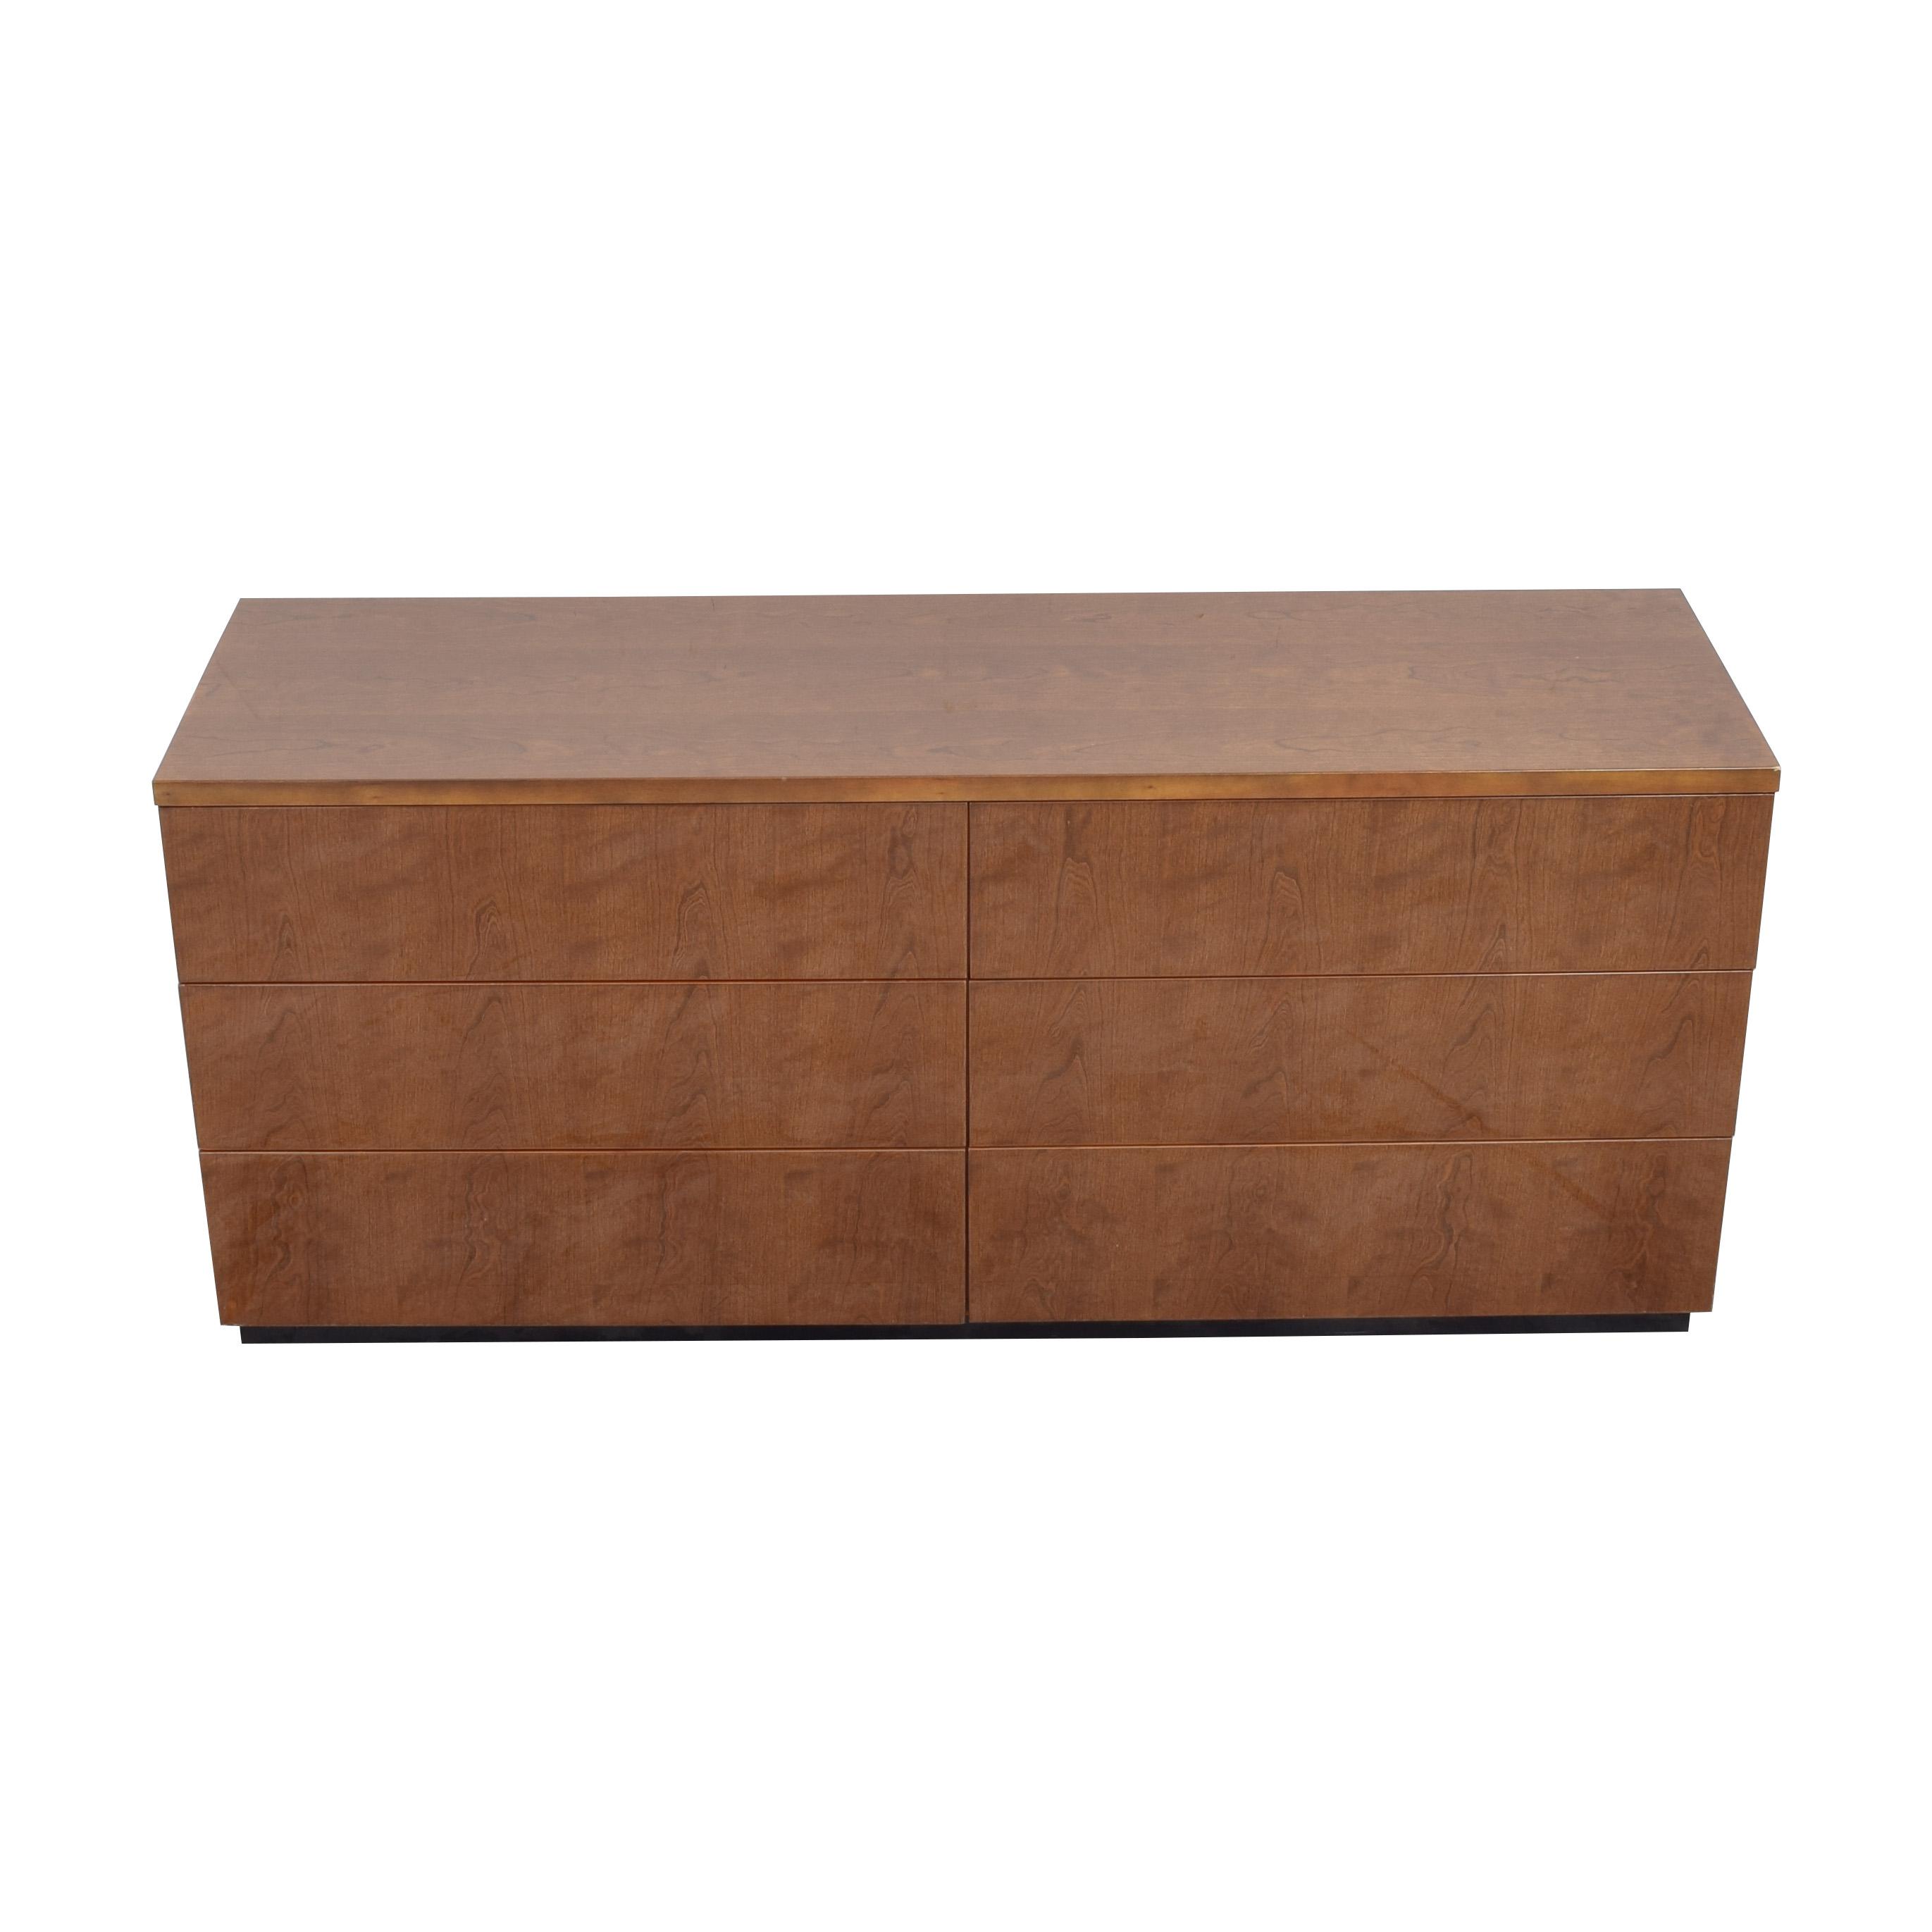 Henredon Furniture Henredon Furniture Six Drawer Dresser second hand